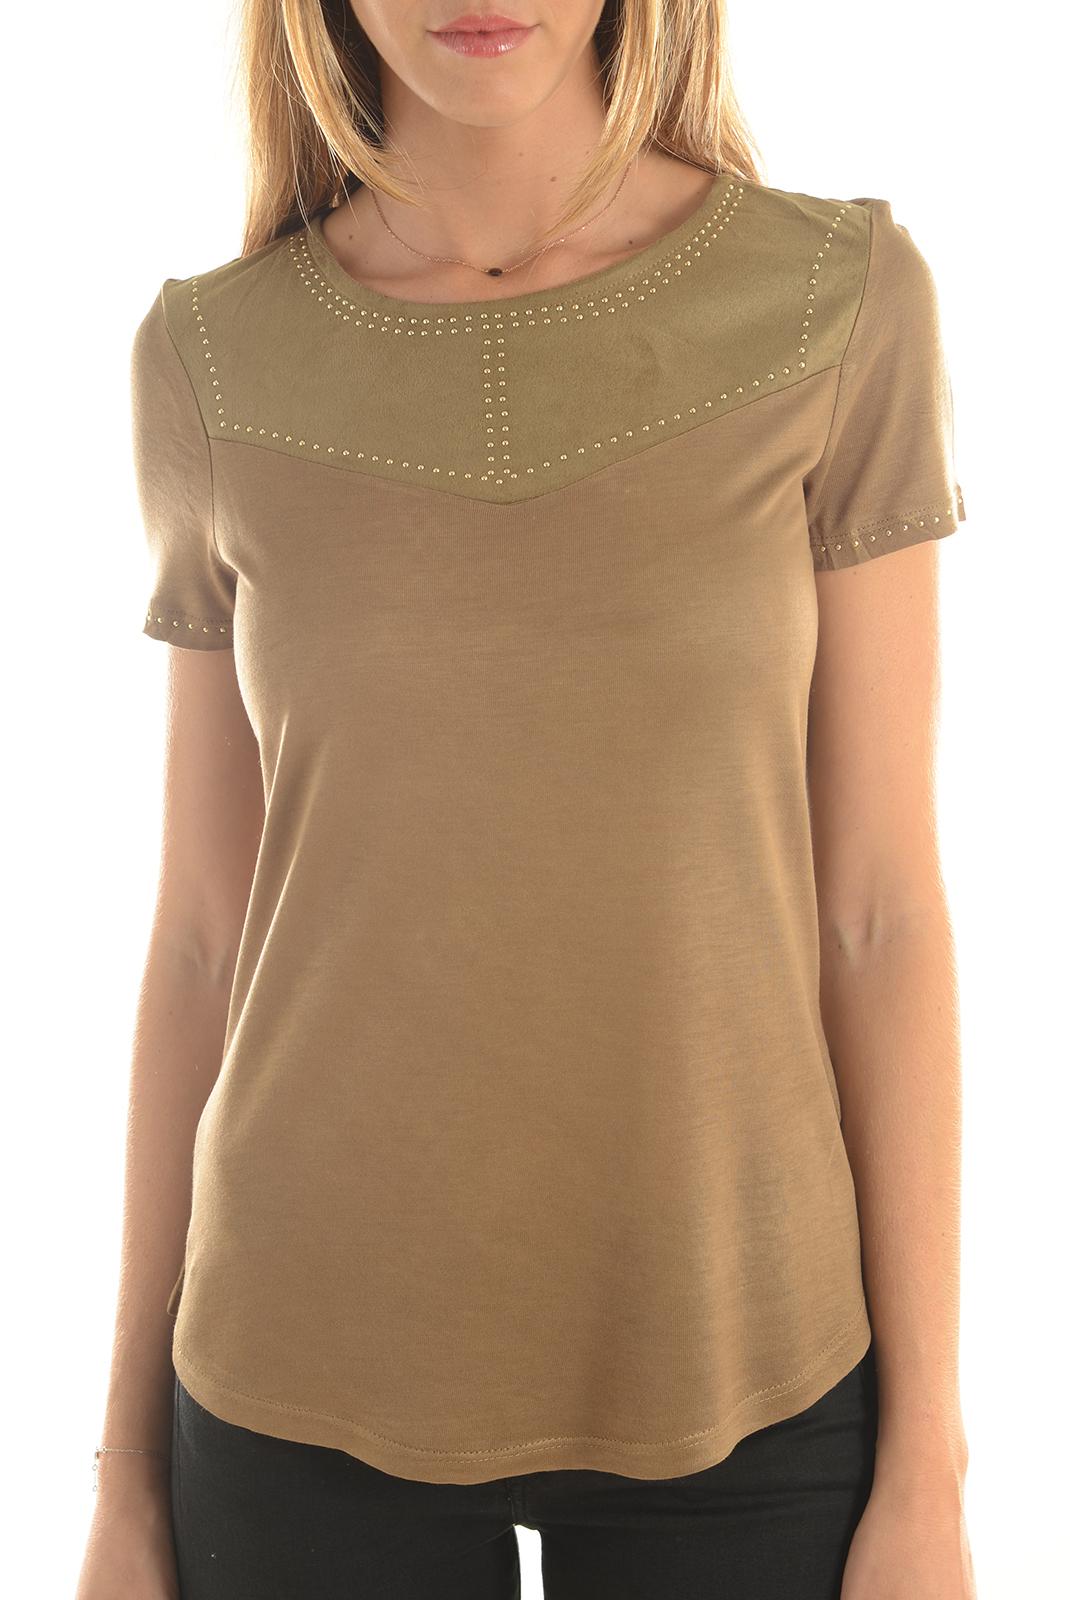 Tops & Tee shirts  Vero moda ELIANA SS TOP KANGAROO